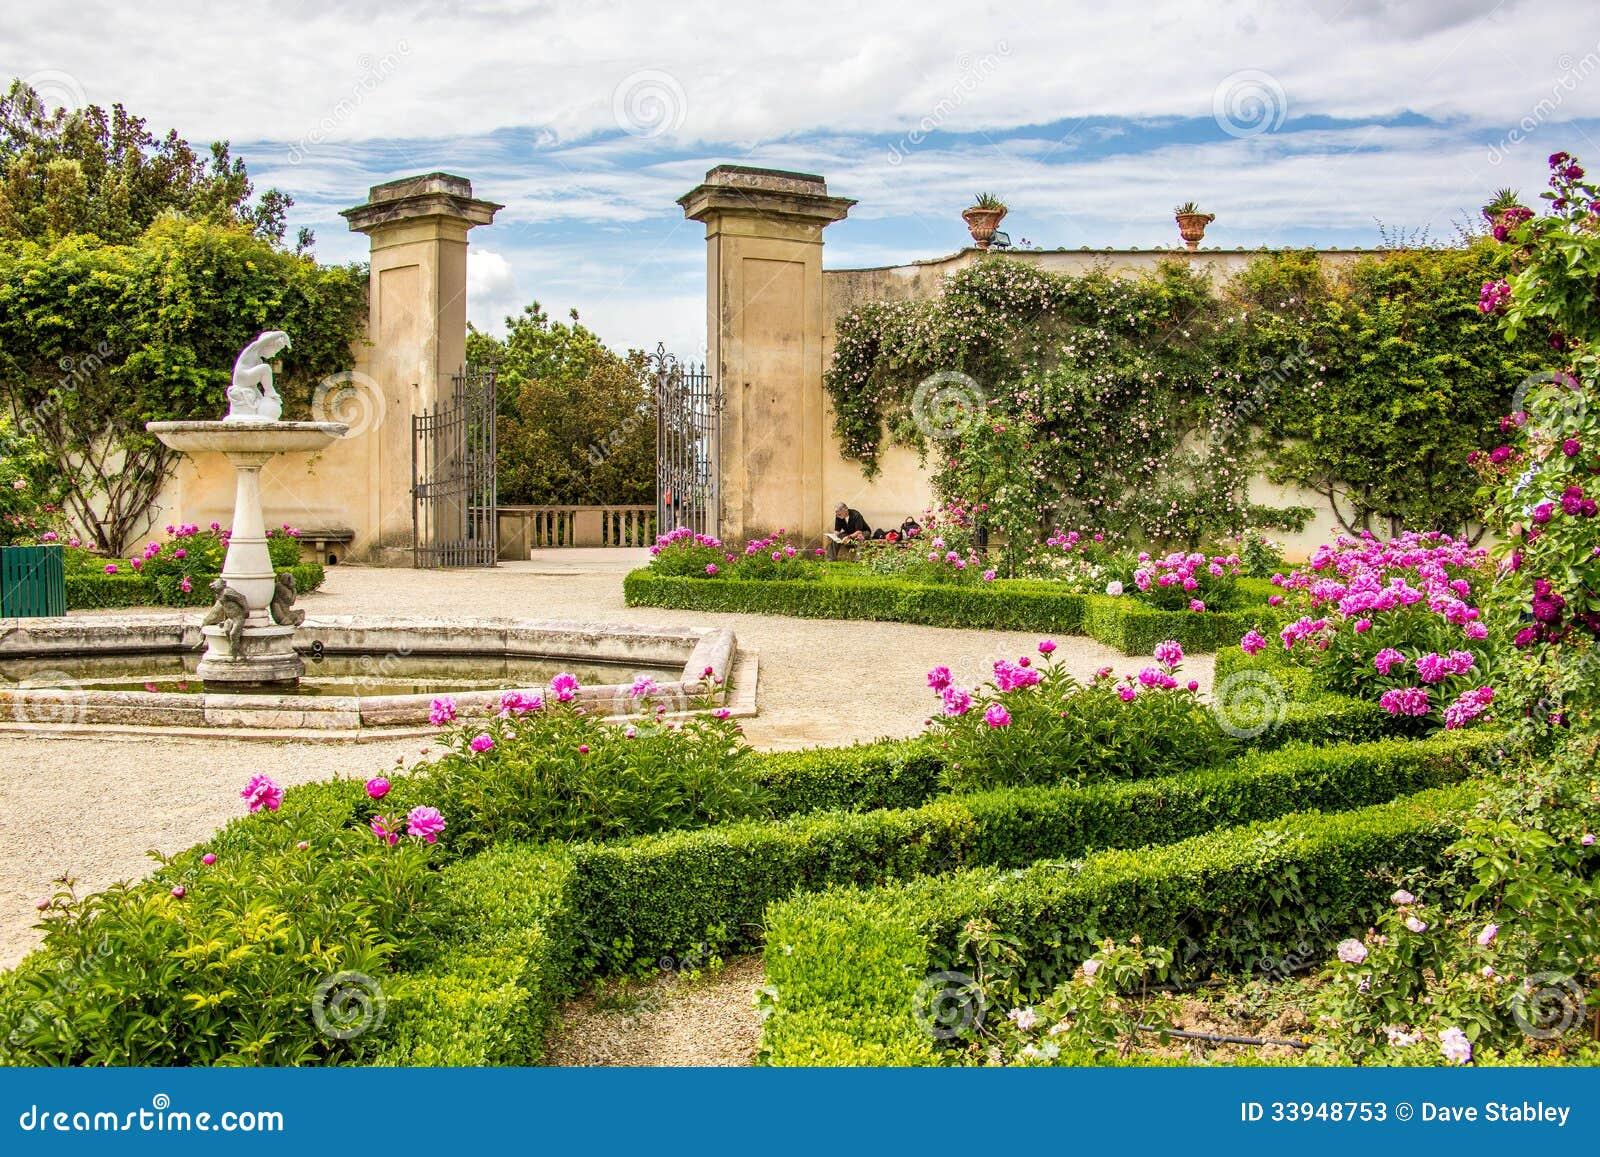 Boboli gardens giardini di boboli florence stock image for Garden giardini